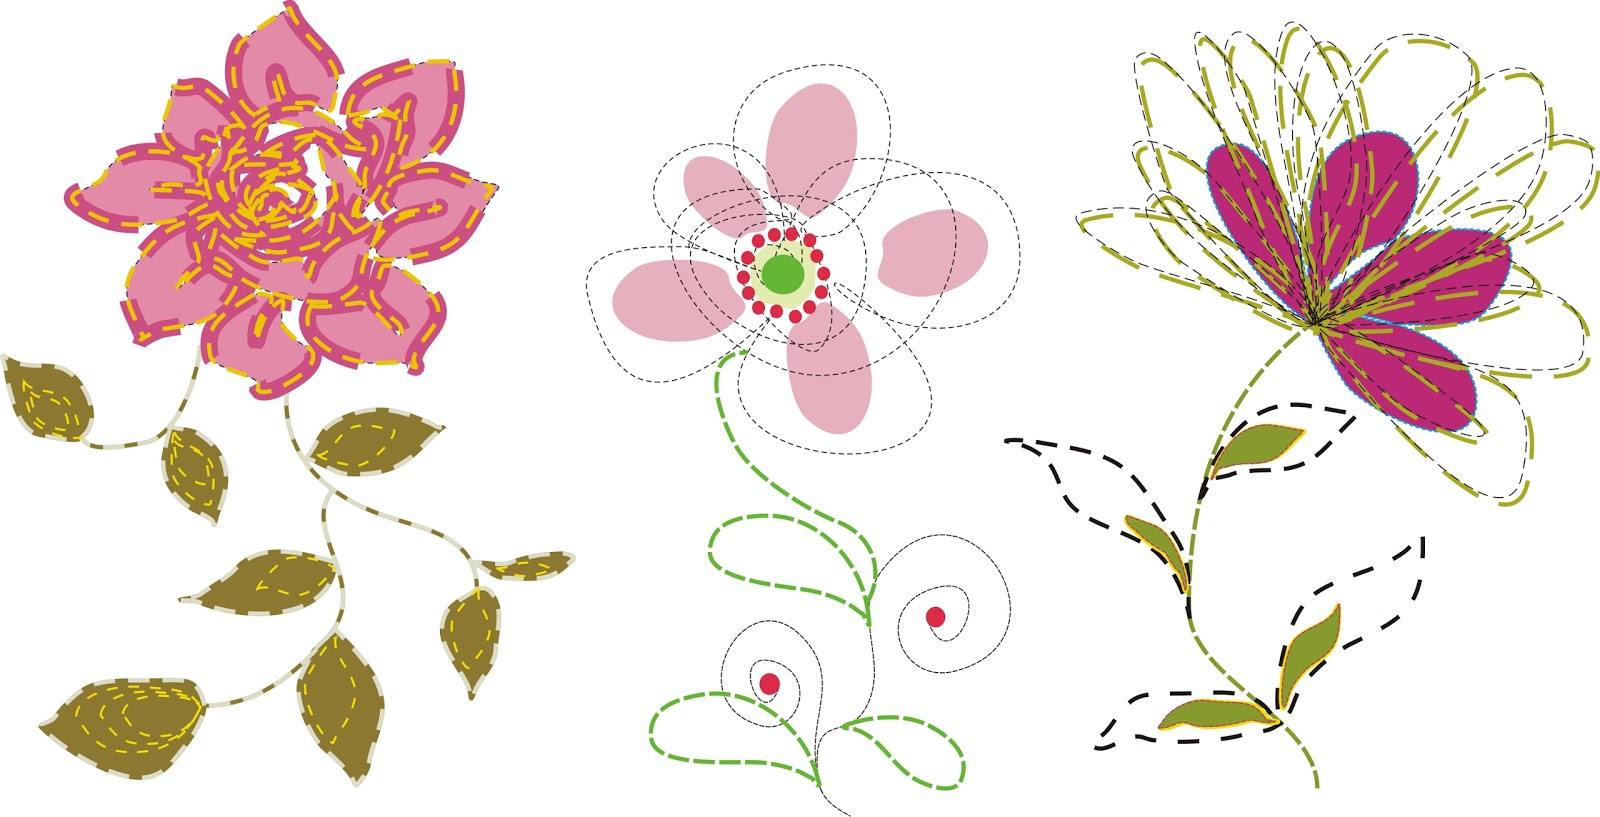 bordir-inspirasi-motif-bordir-motif-bordir-bunga-abstrak.jpg. bordir ...